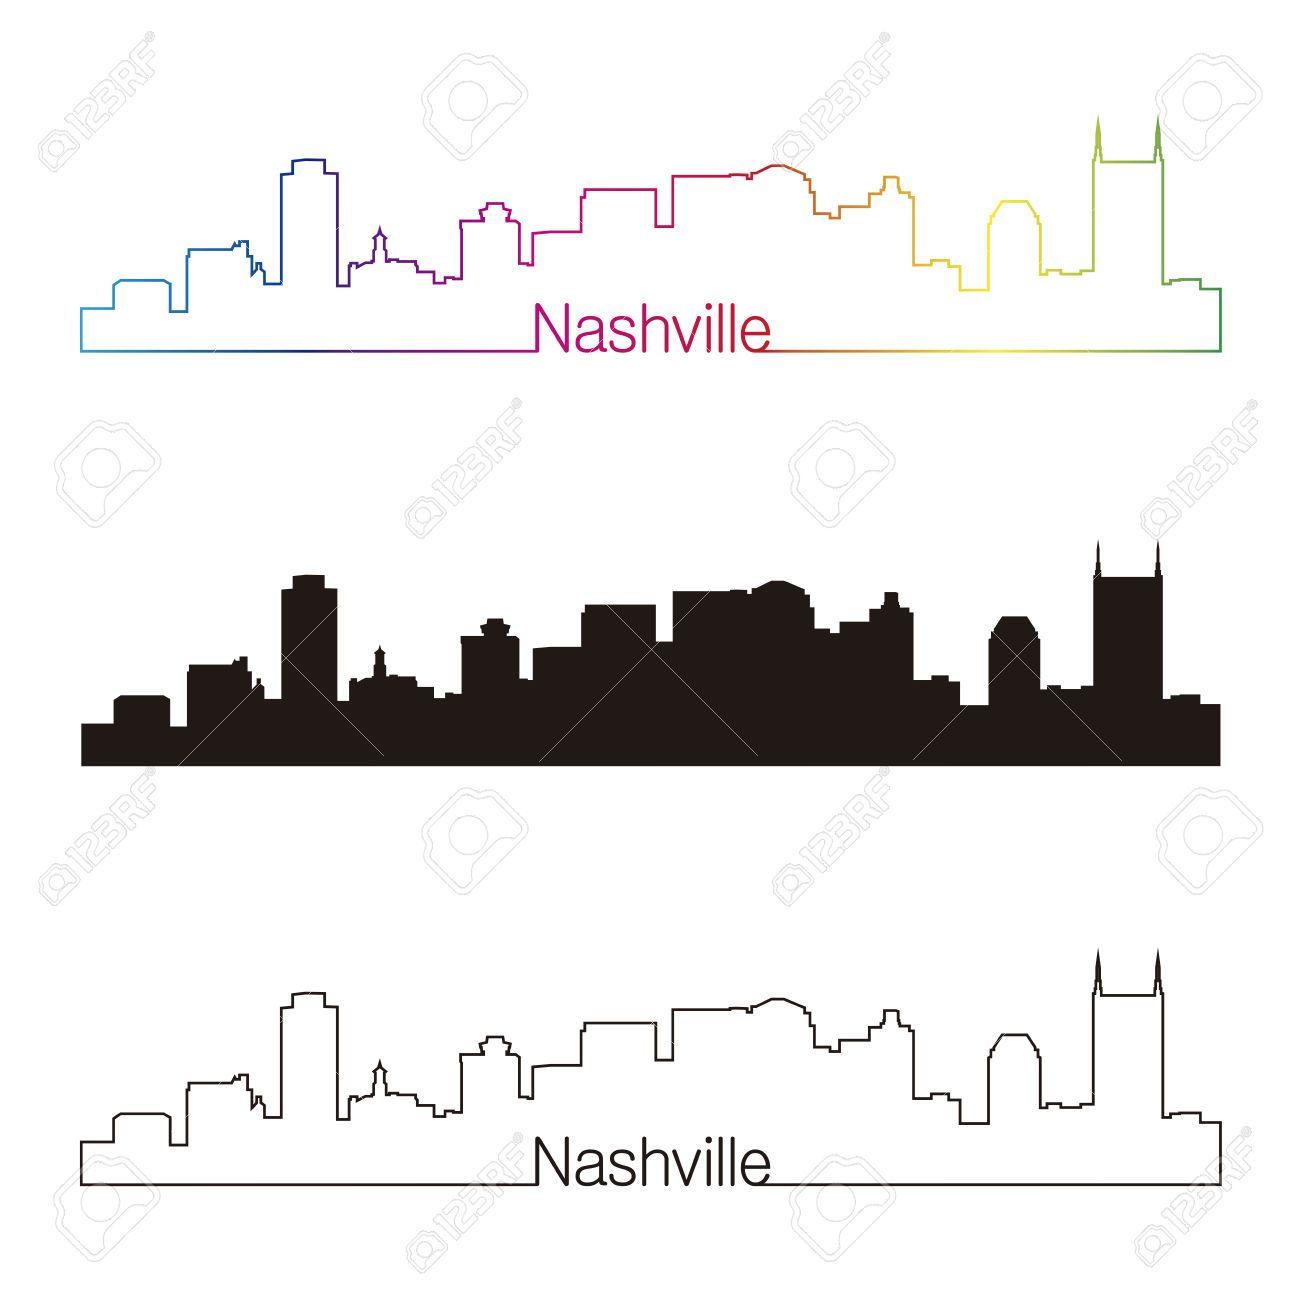 Nashville Skyline Silhouette Google Search Nashville Skyline Skyline Drawing Nashville Art